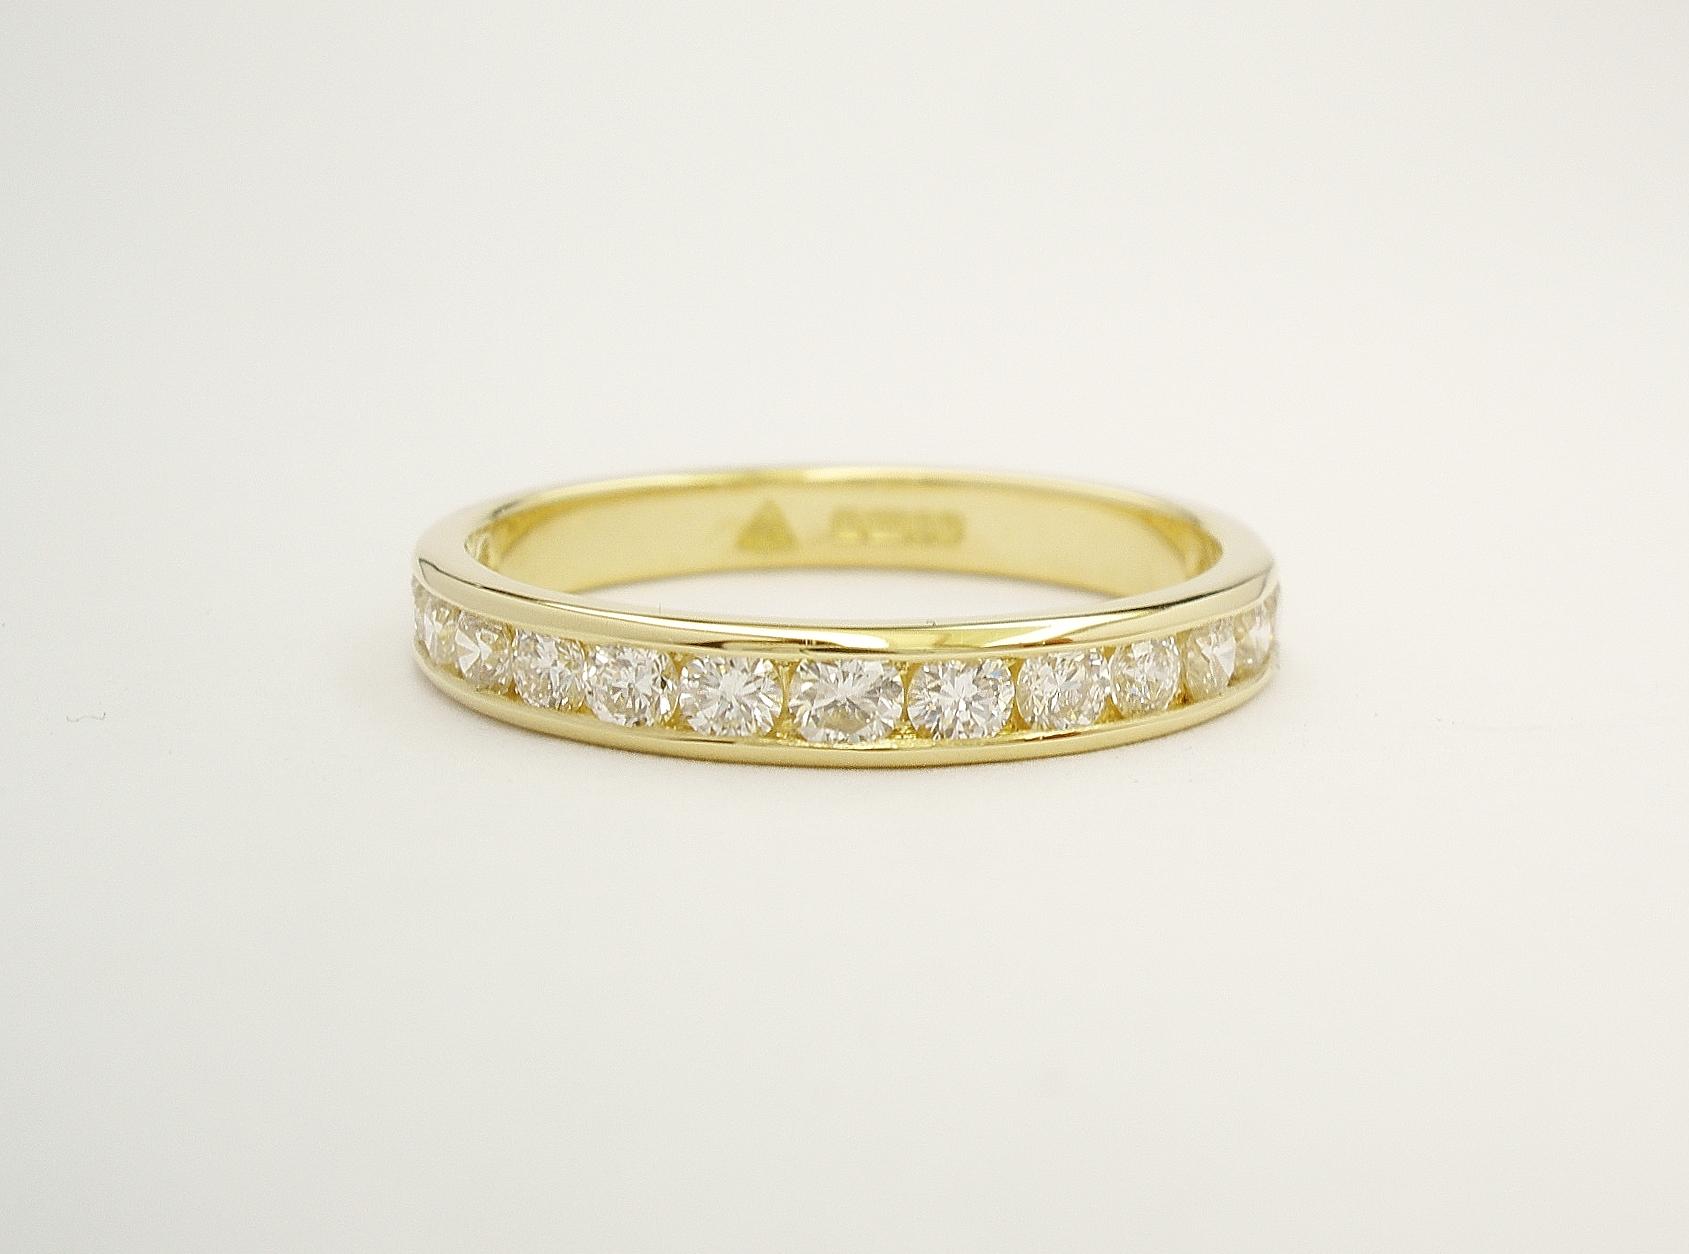 Platinum & channel set round brilliant cut diamond wedding ring set to 55% cover.